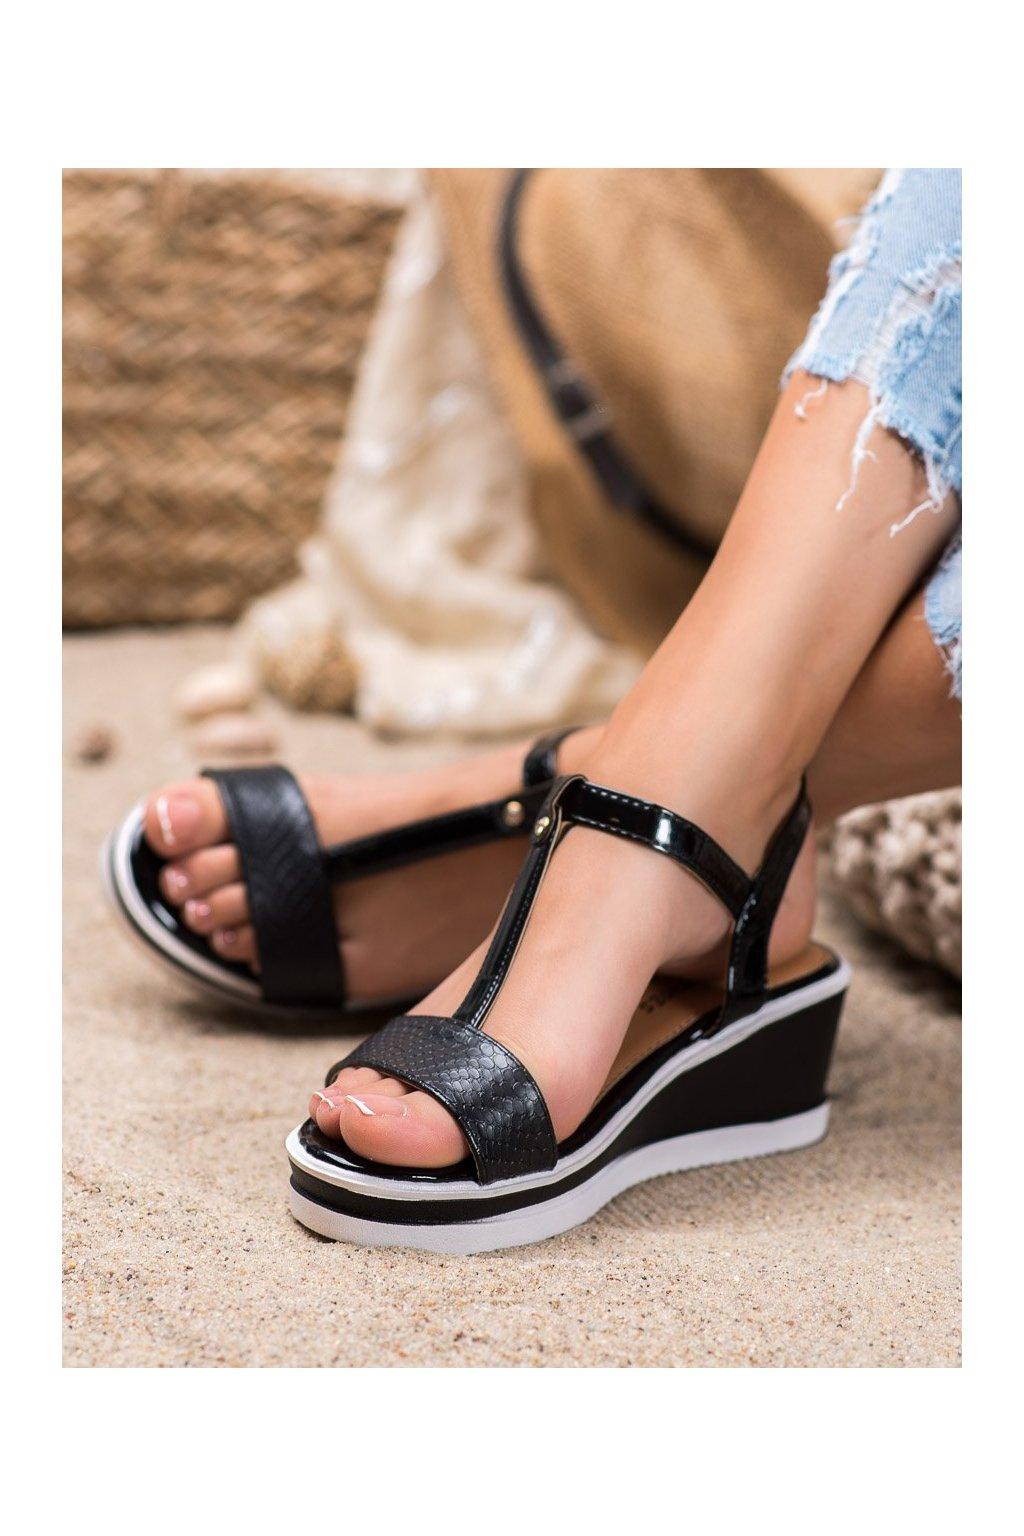 Čierne sandále Shelovet kod 88-44B